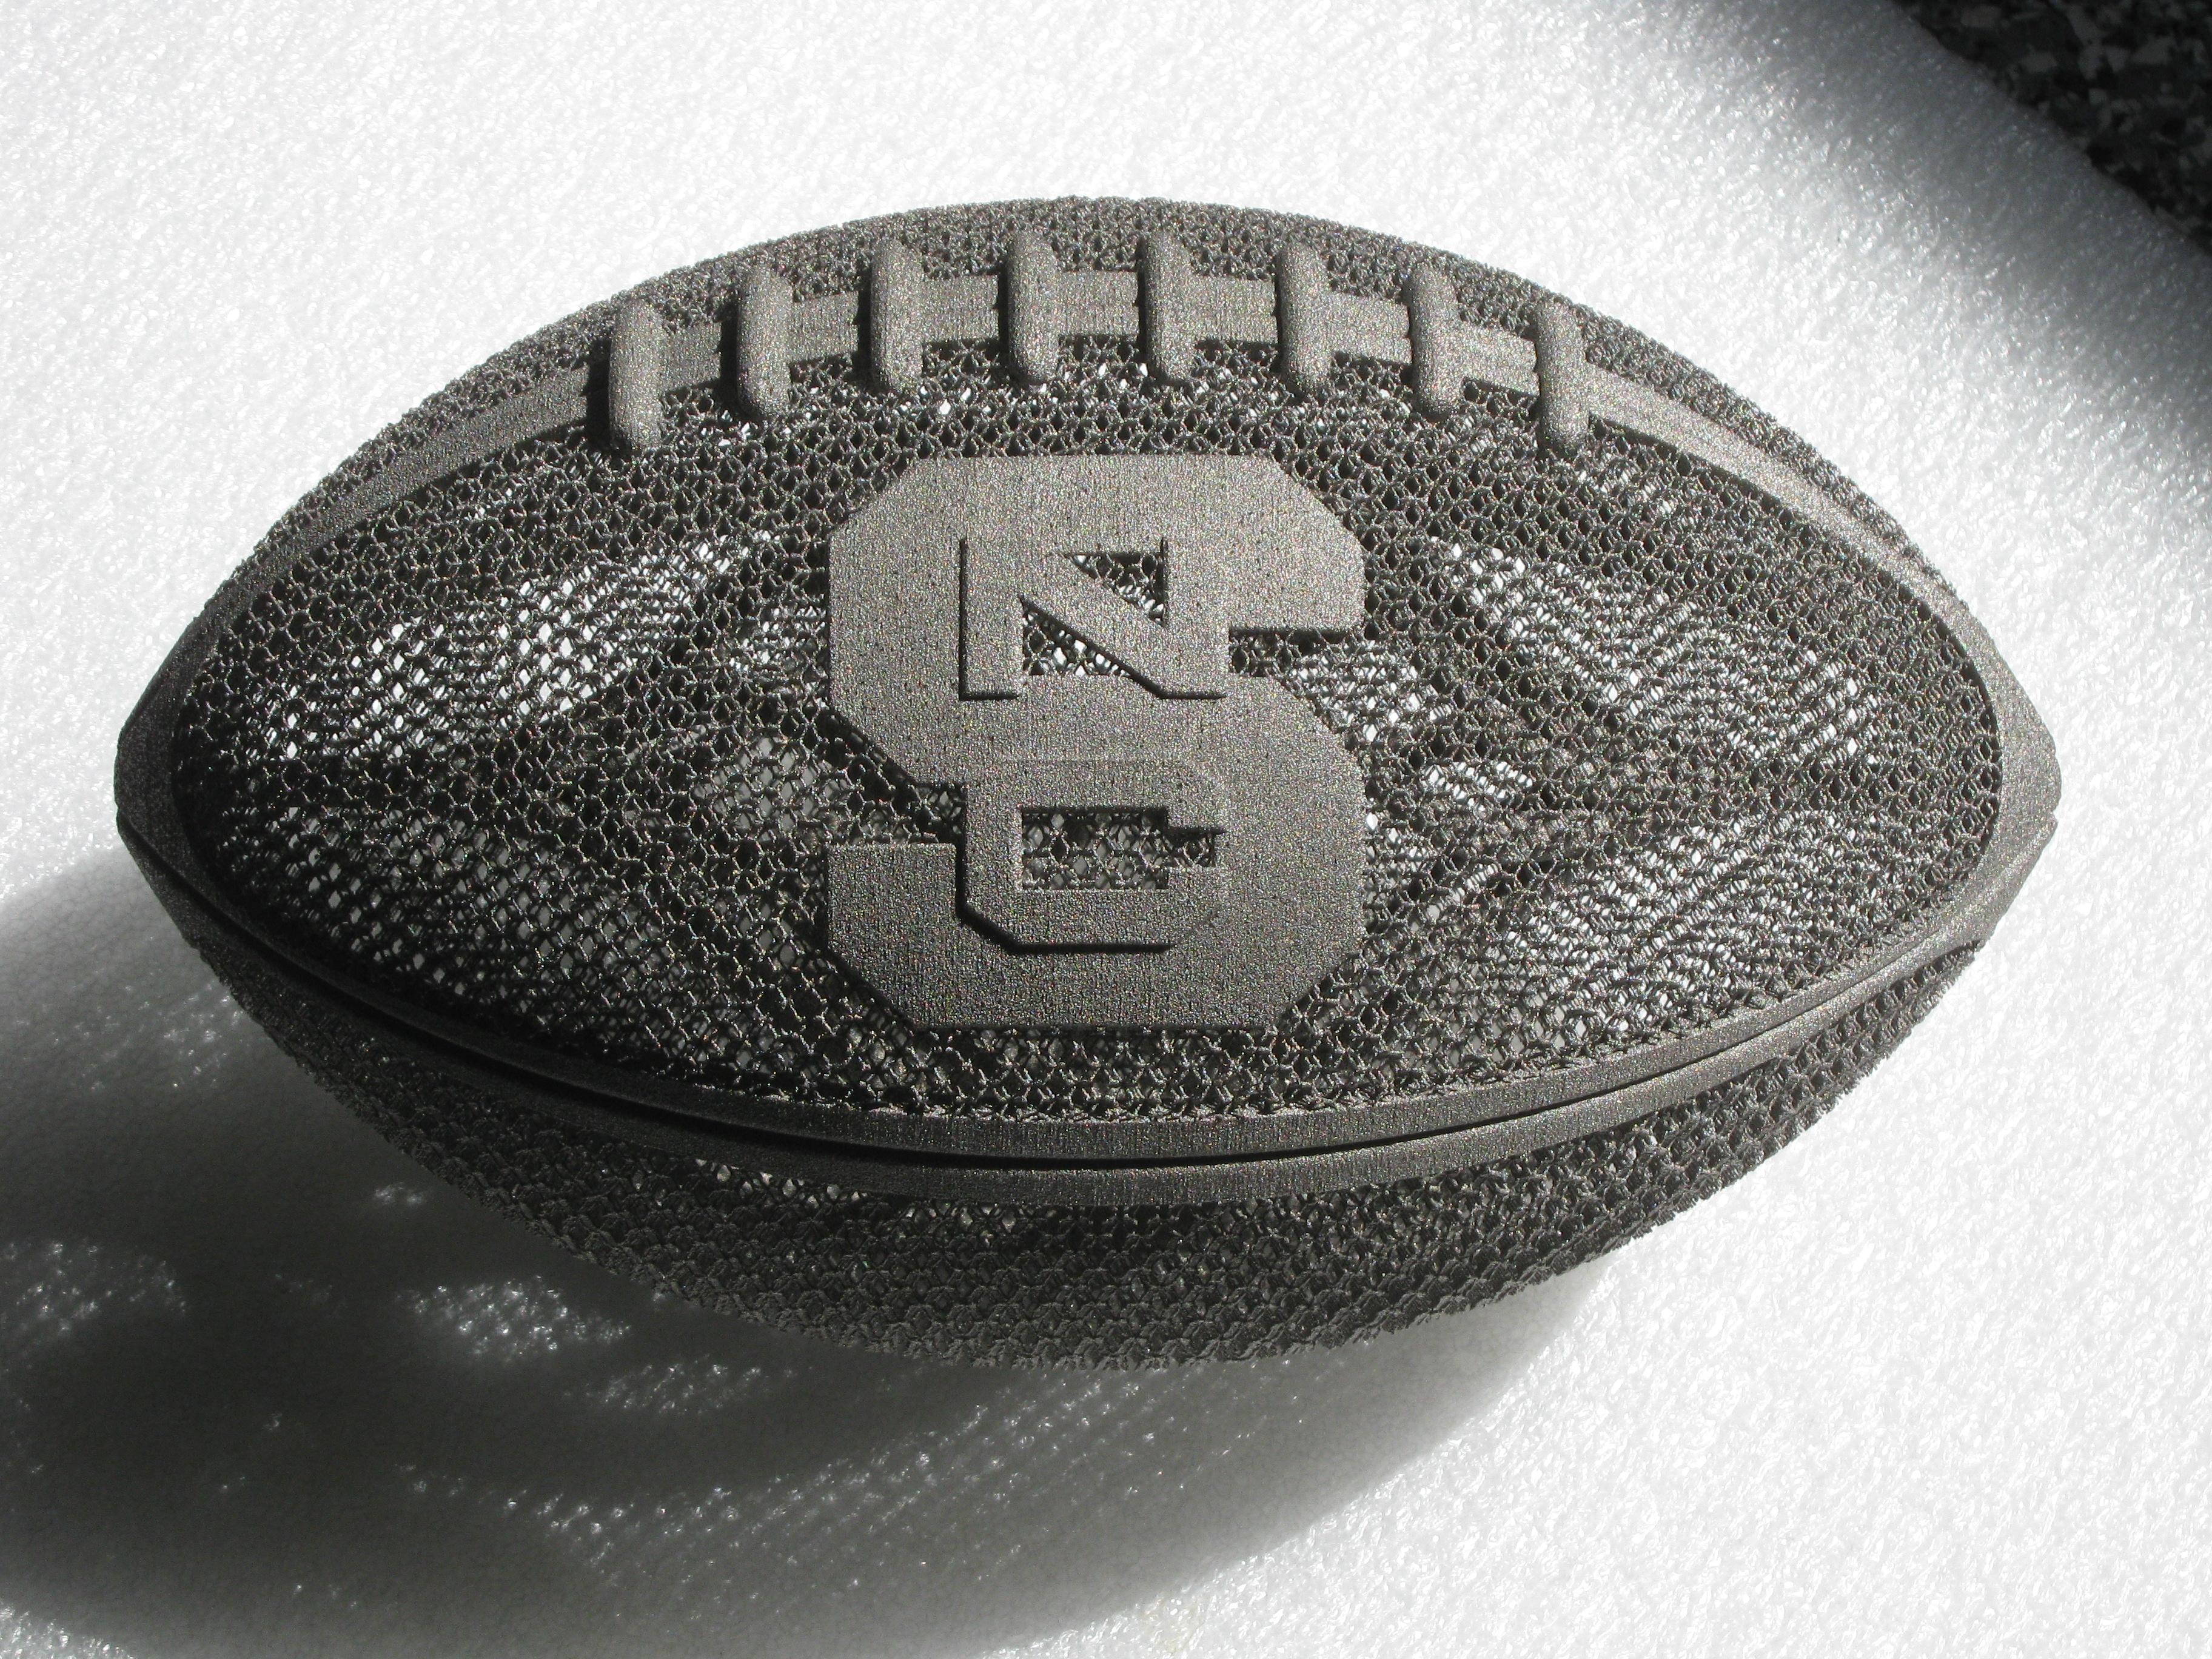 3D Printed NCSU Football